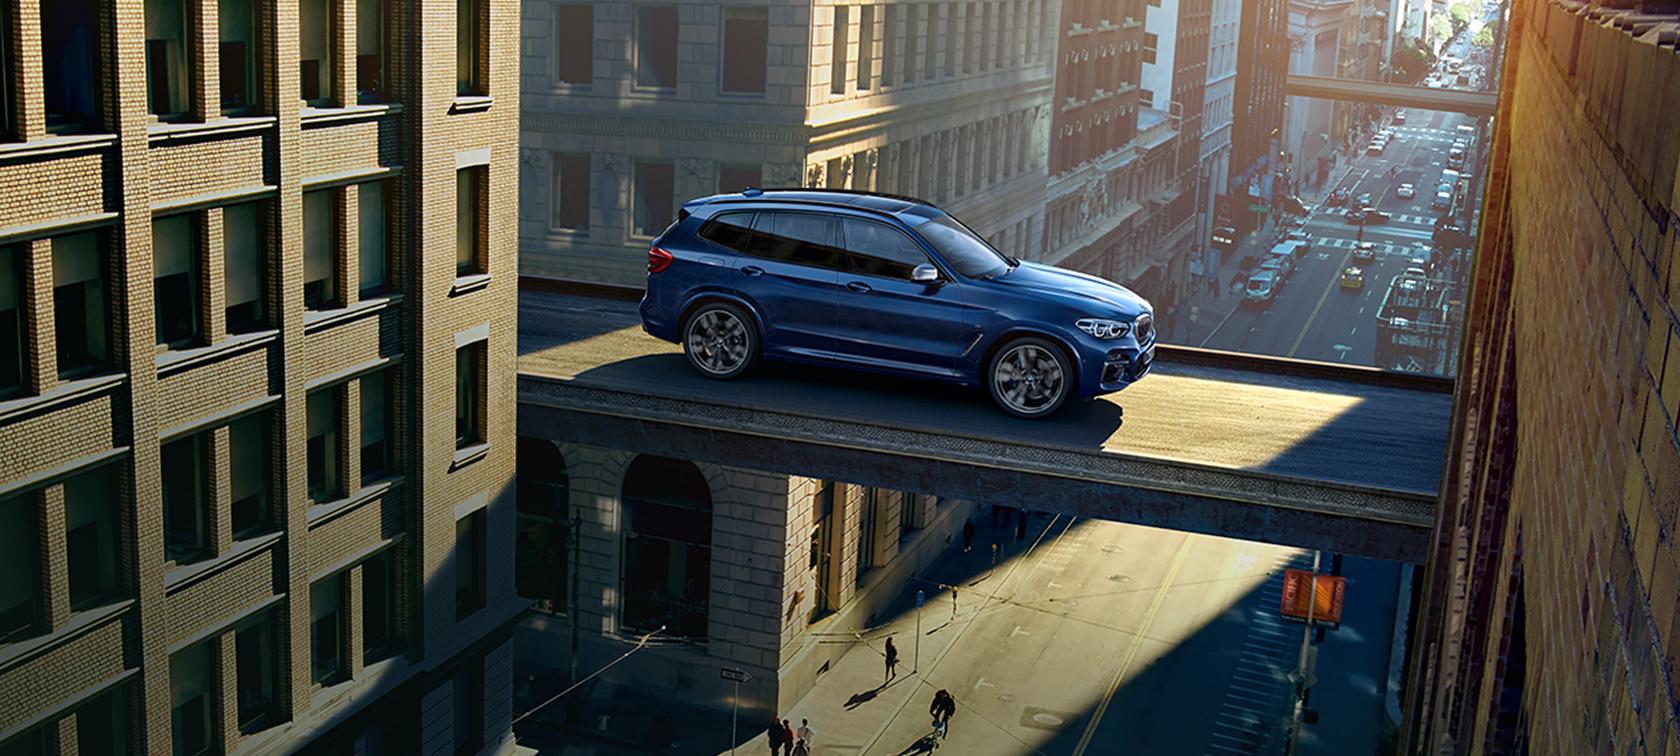 BMW X3 im Autohaus Märtin